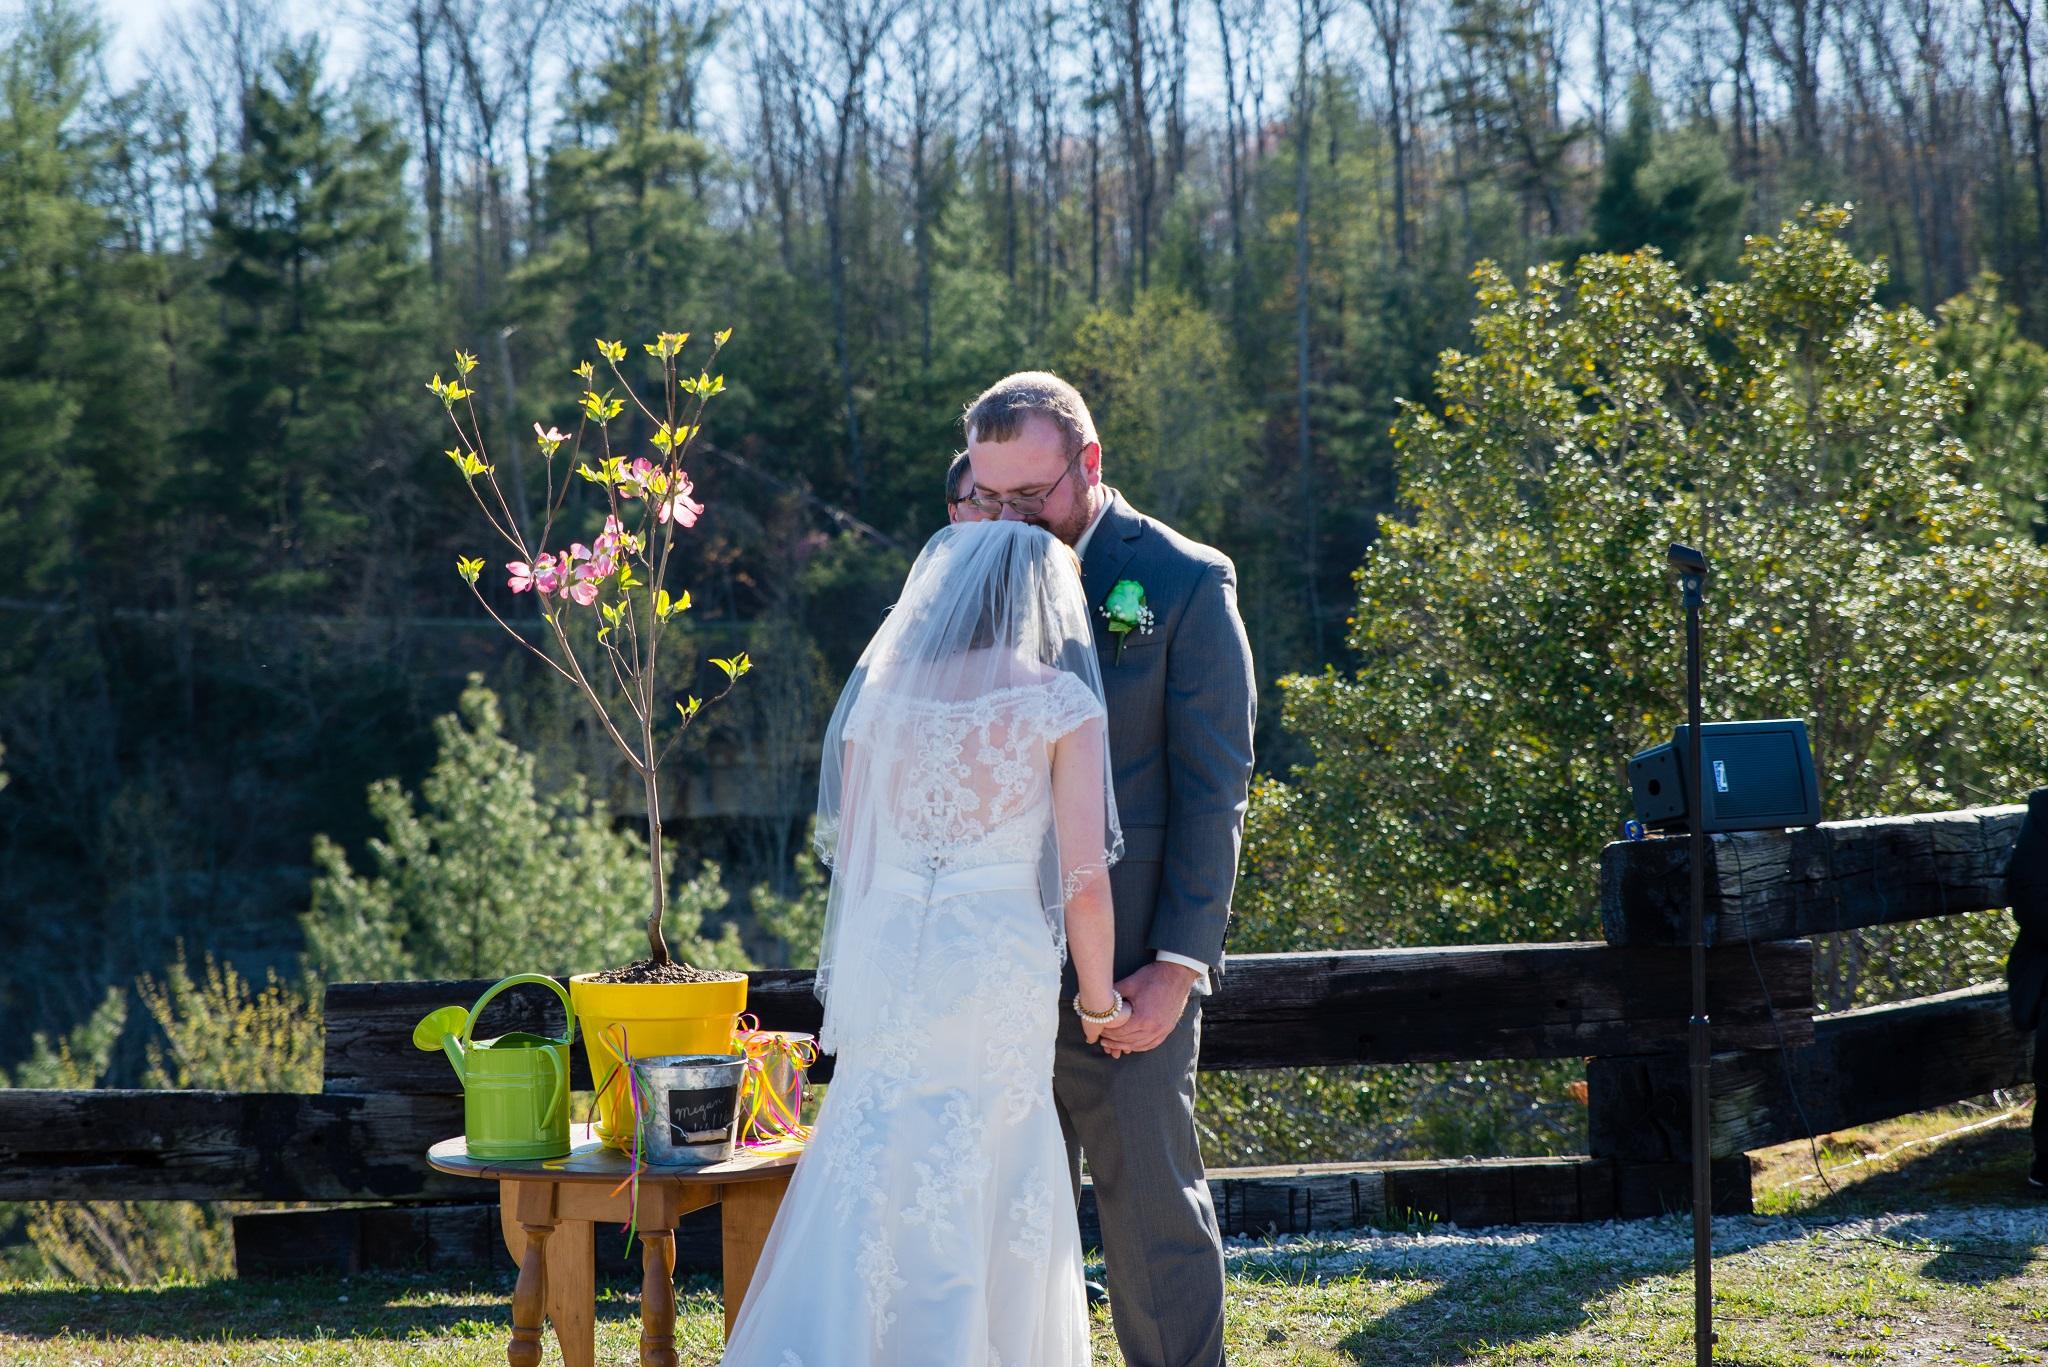 Cliffview Resort, resort wedding, red river gorge, kentucky wedding, kentucky bride, ky wedding photographers